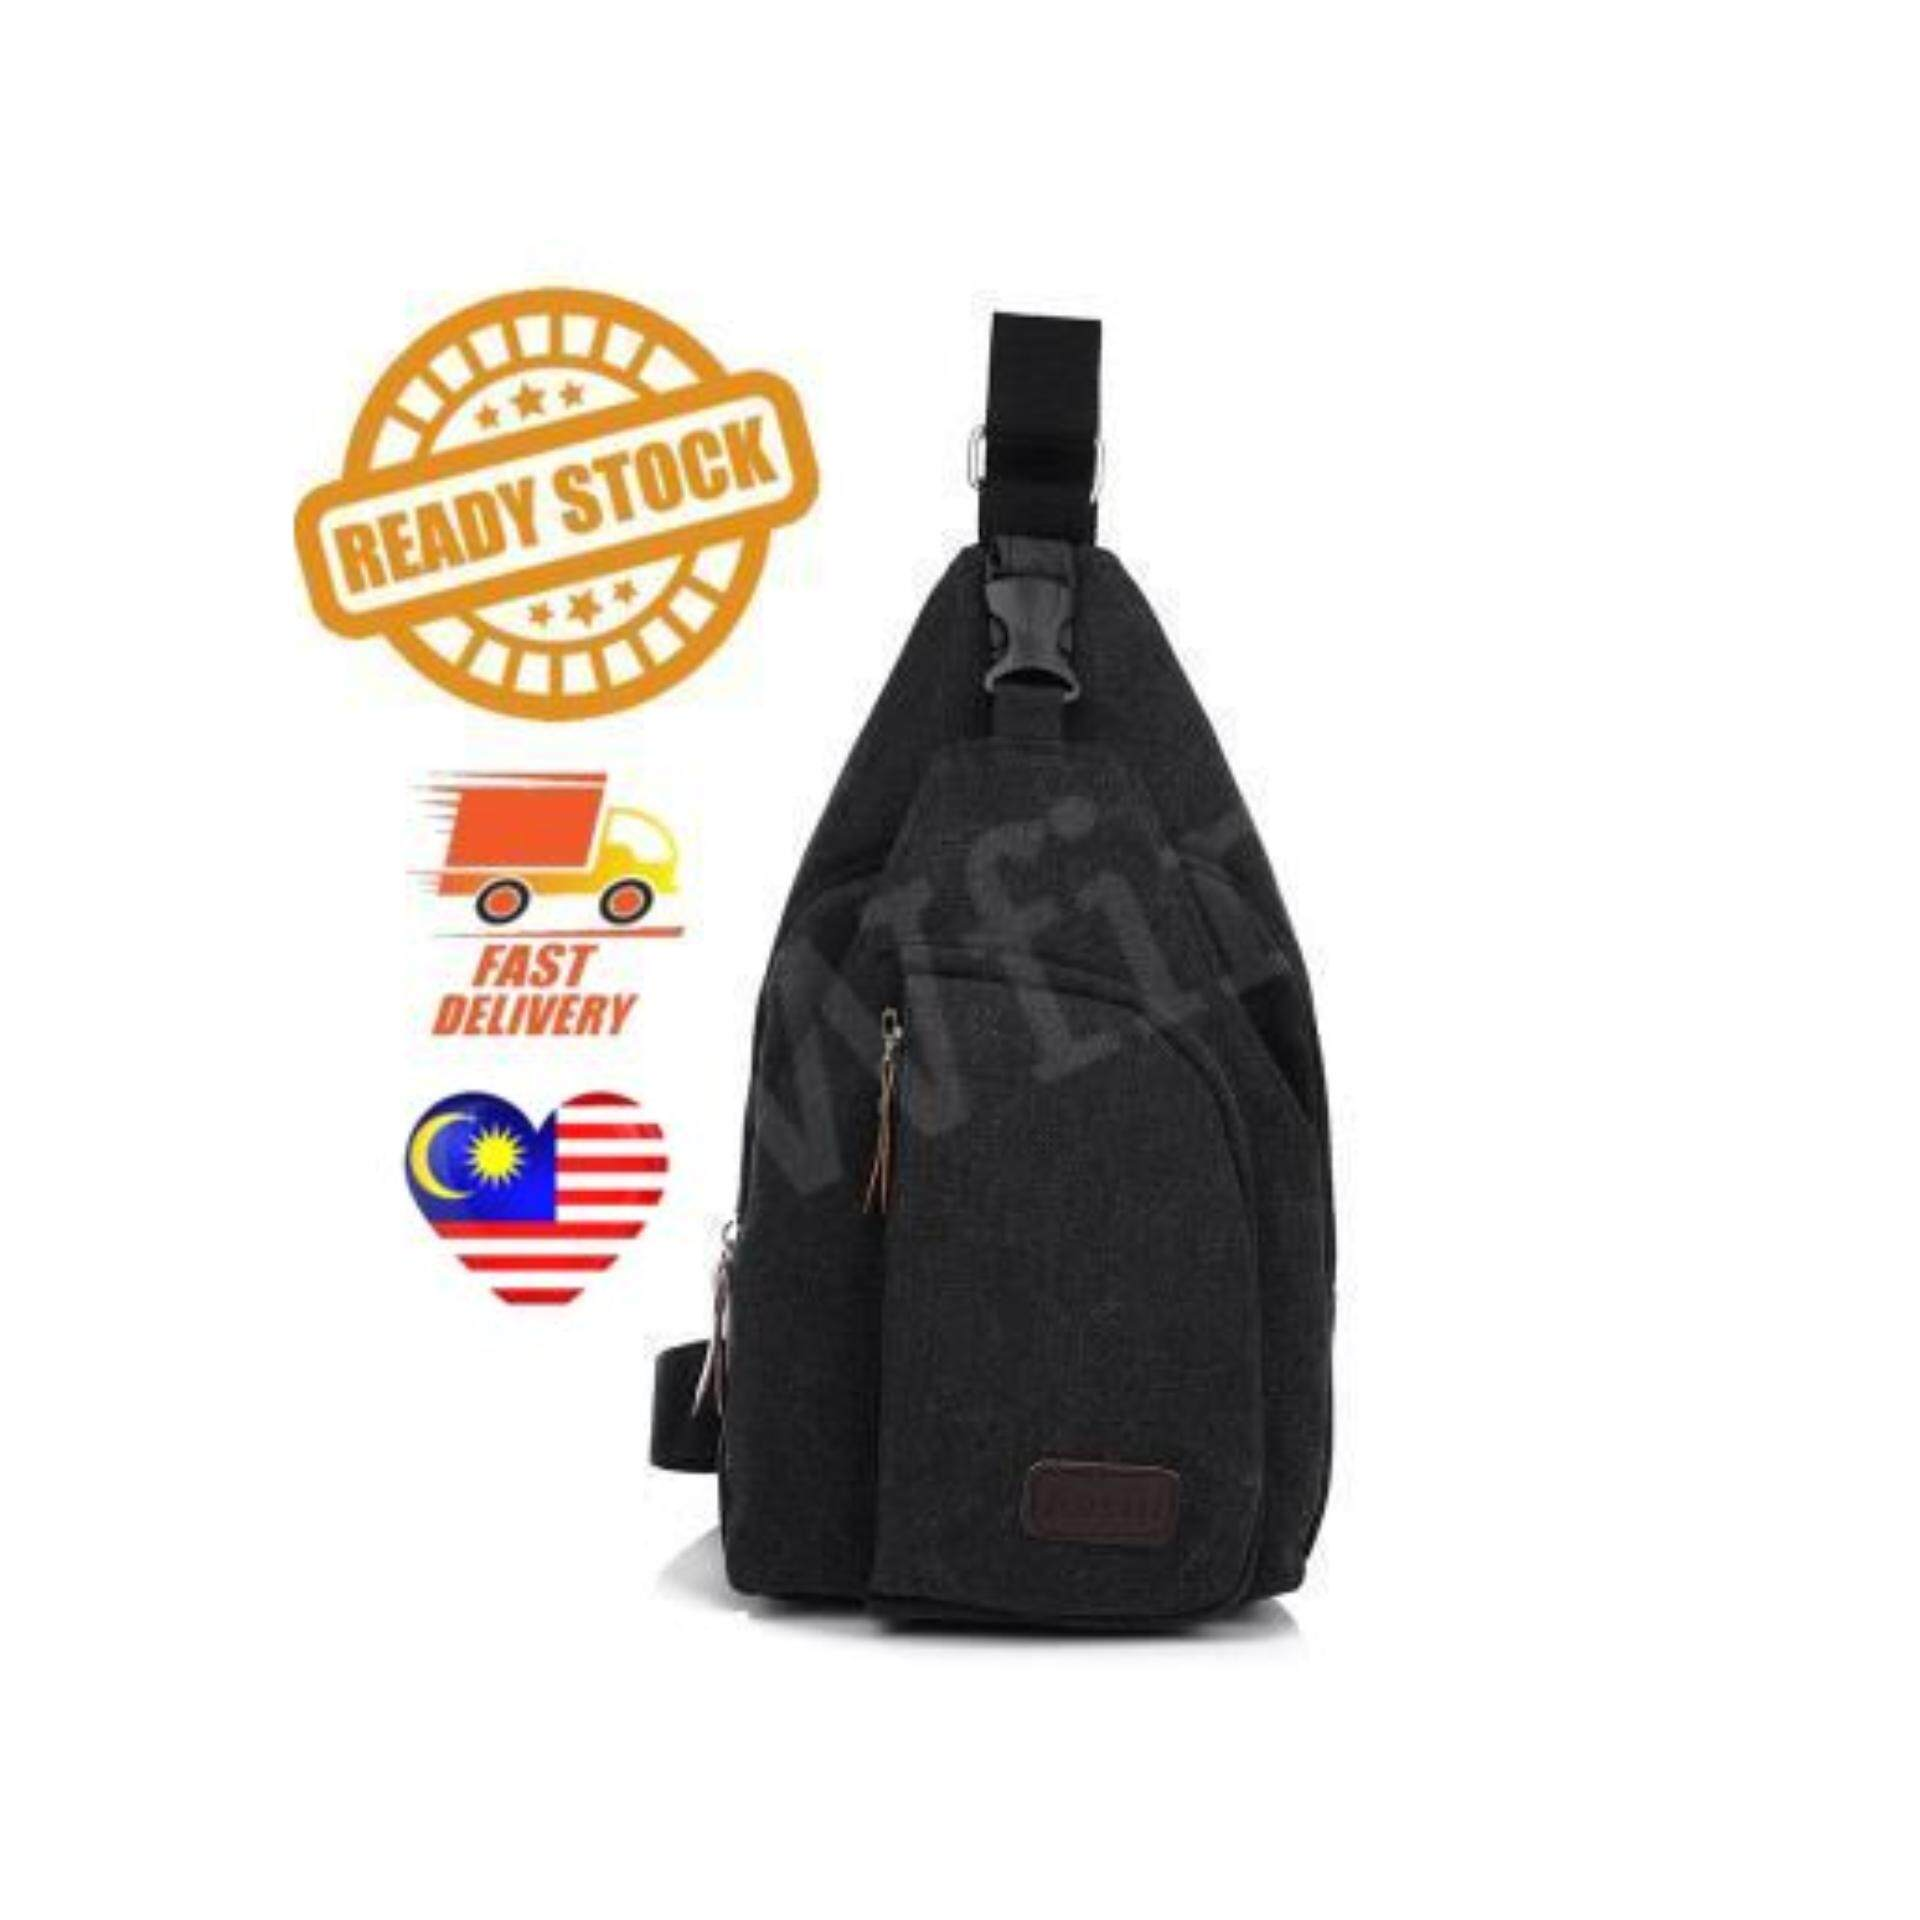 4f2fde57cc Men Crossbody Bags. 87103 items found in Crossbody Bags. BEST DEALMen s  Chest Canvas Sling bag casual bag